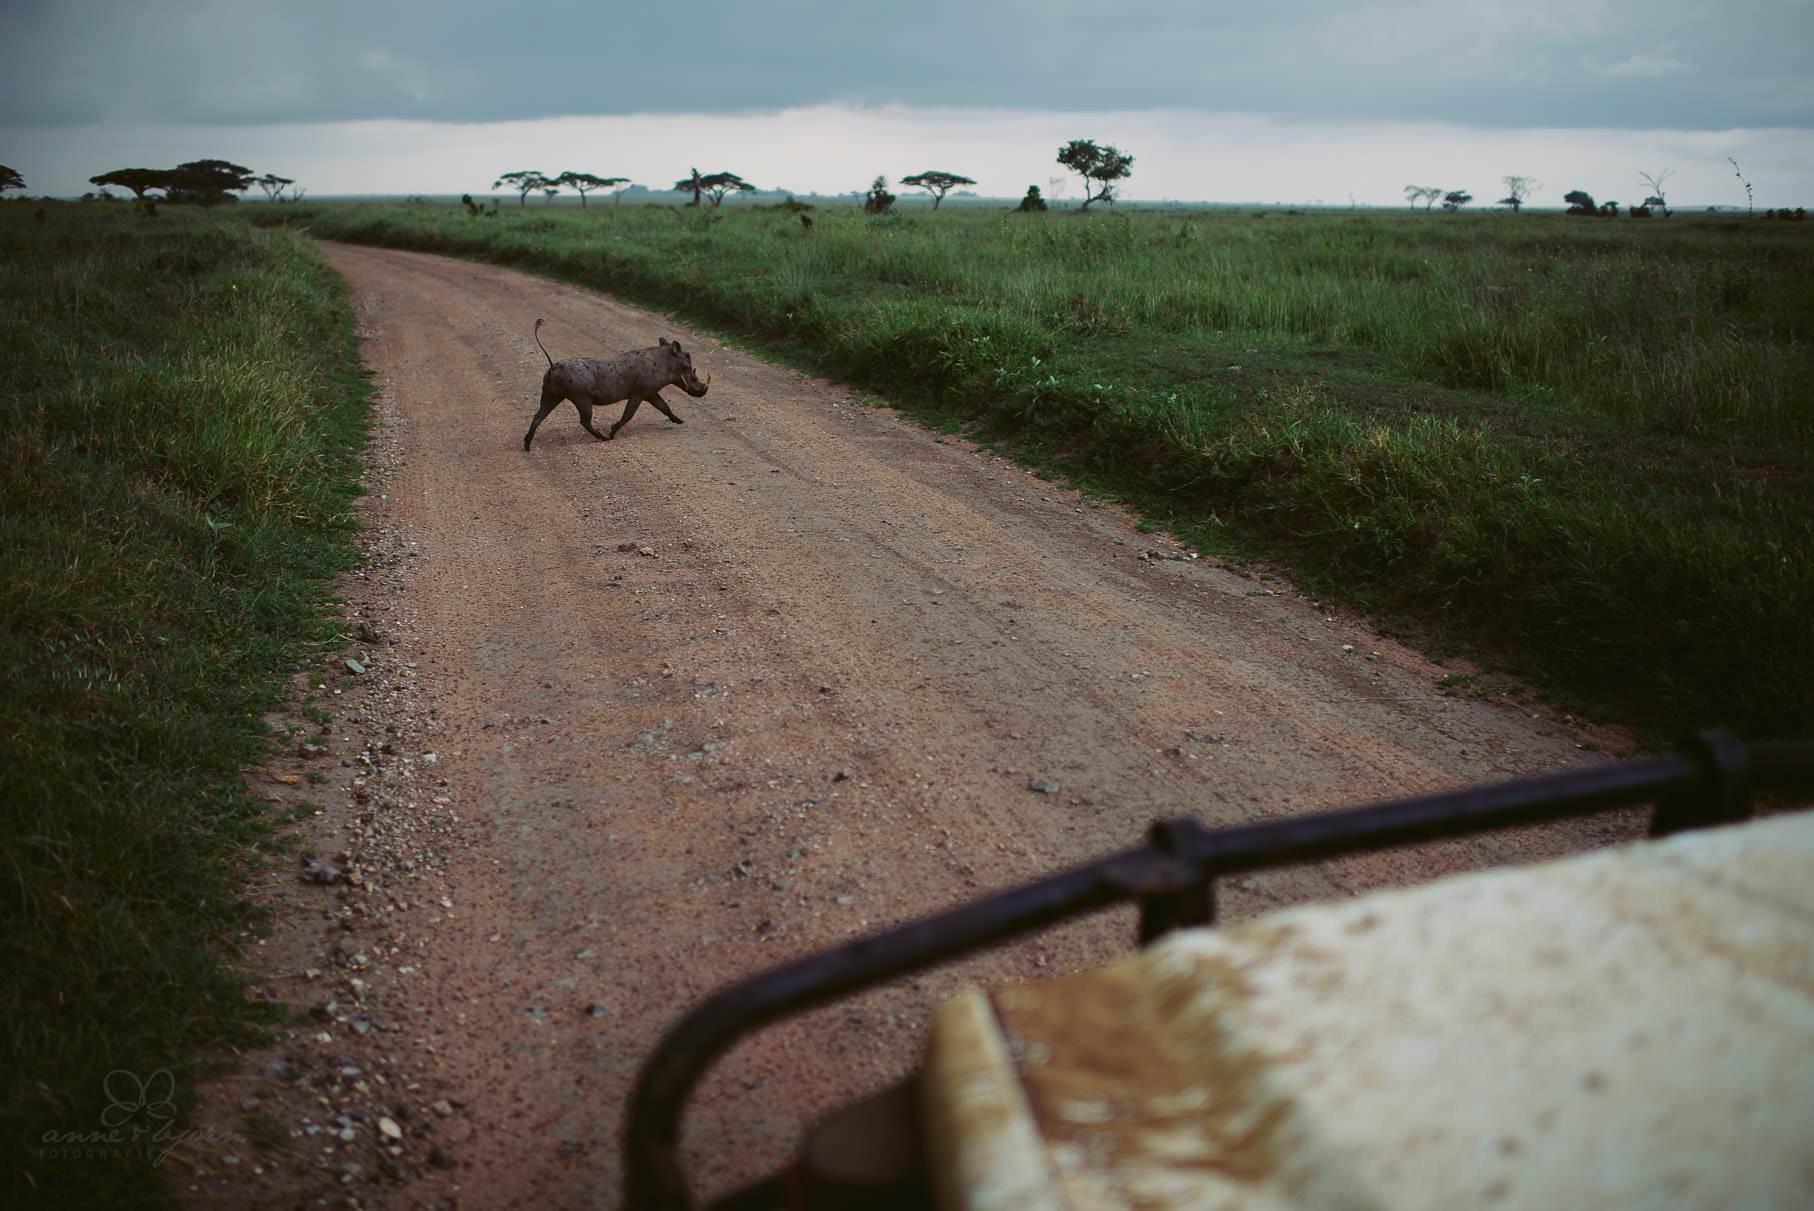 0033 tansania nd8 0336 anne bjoern fotografie hochzeitsfotograf hamburg - This is Tanzania - Serengeti, Kilimanjaro & Sansibar